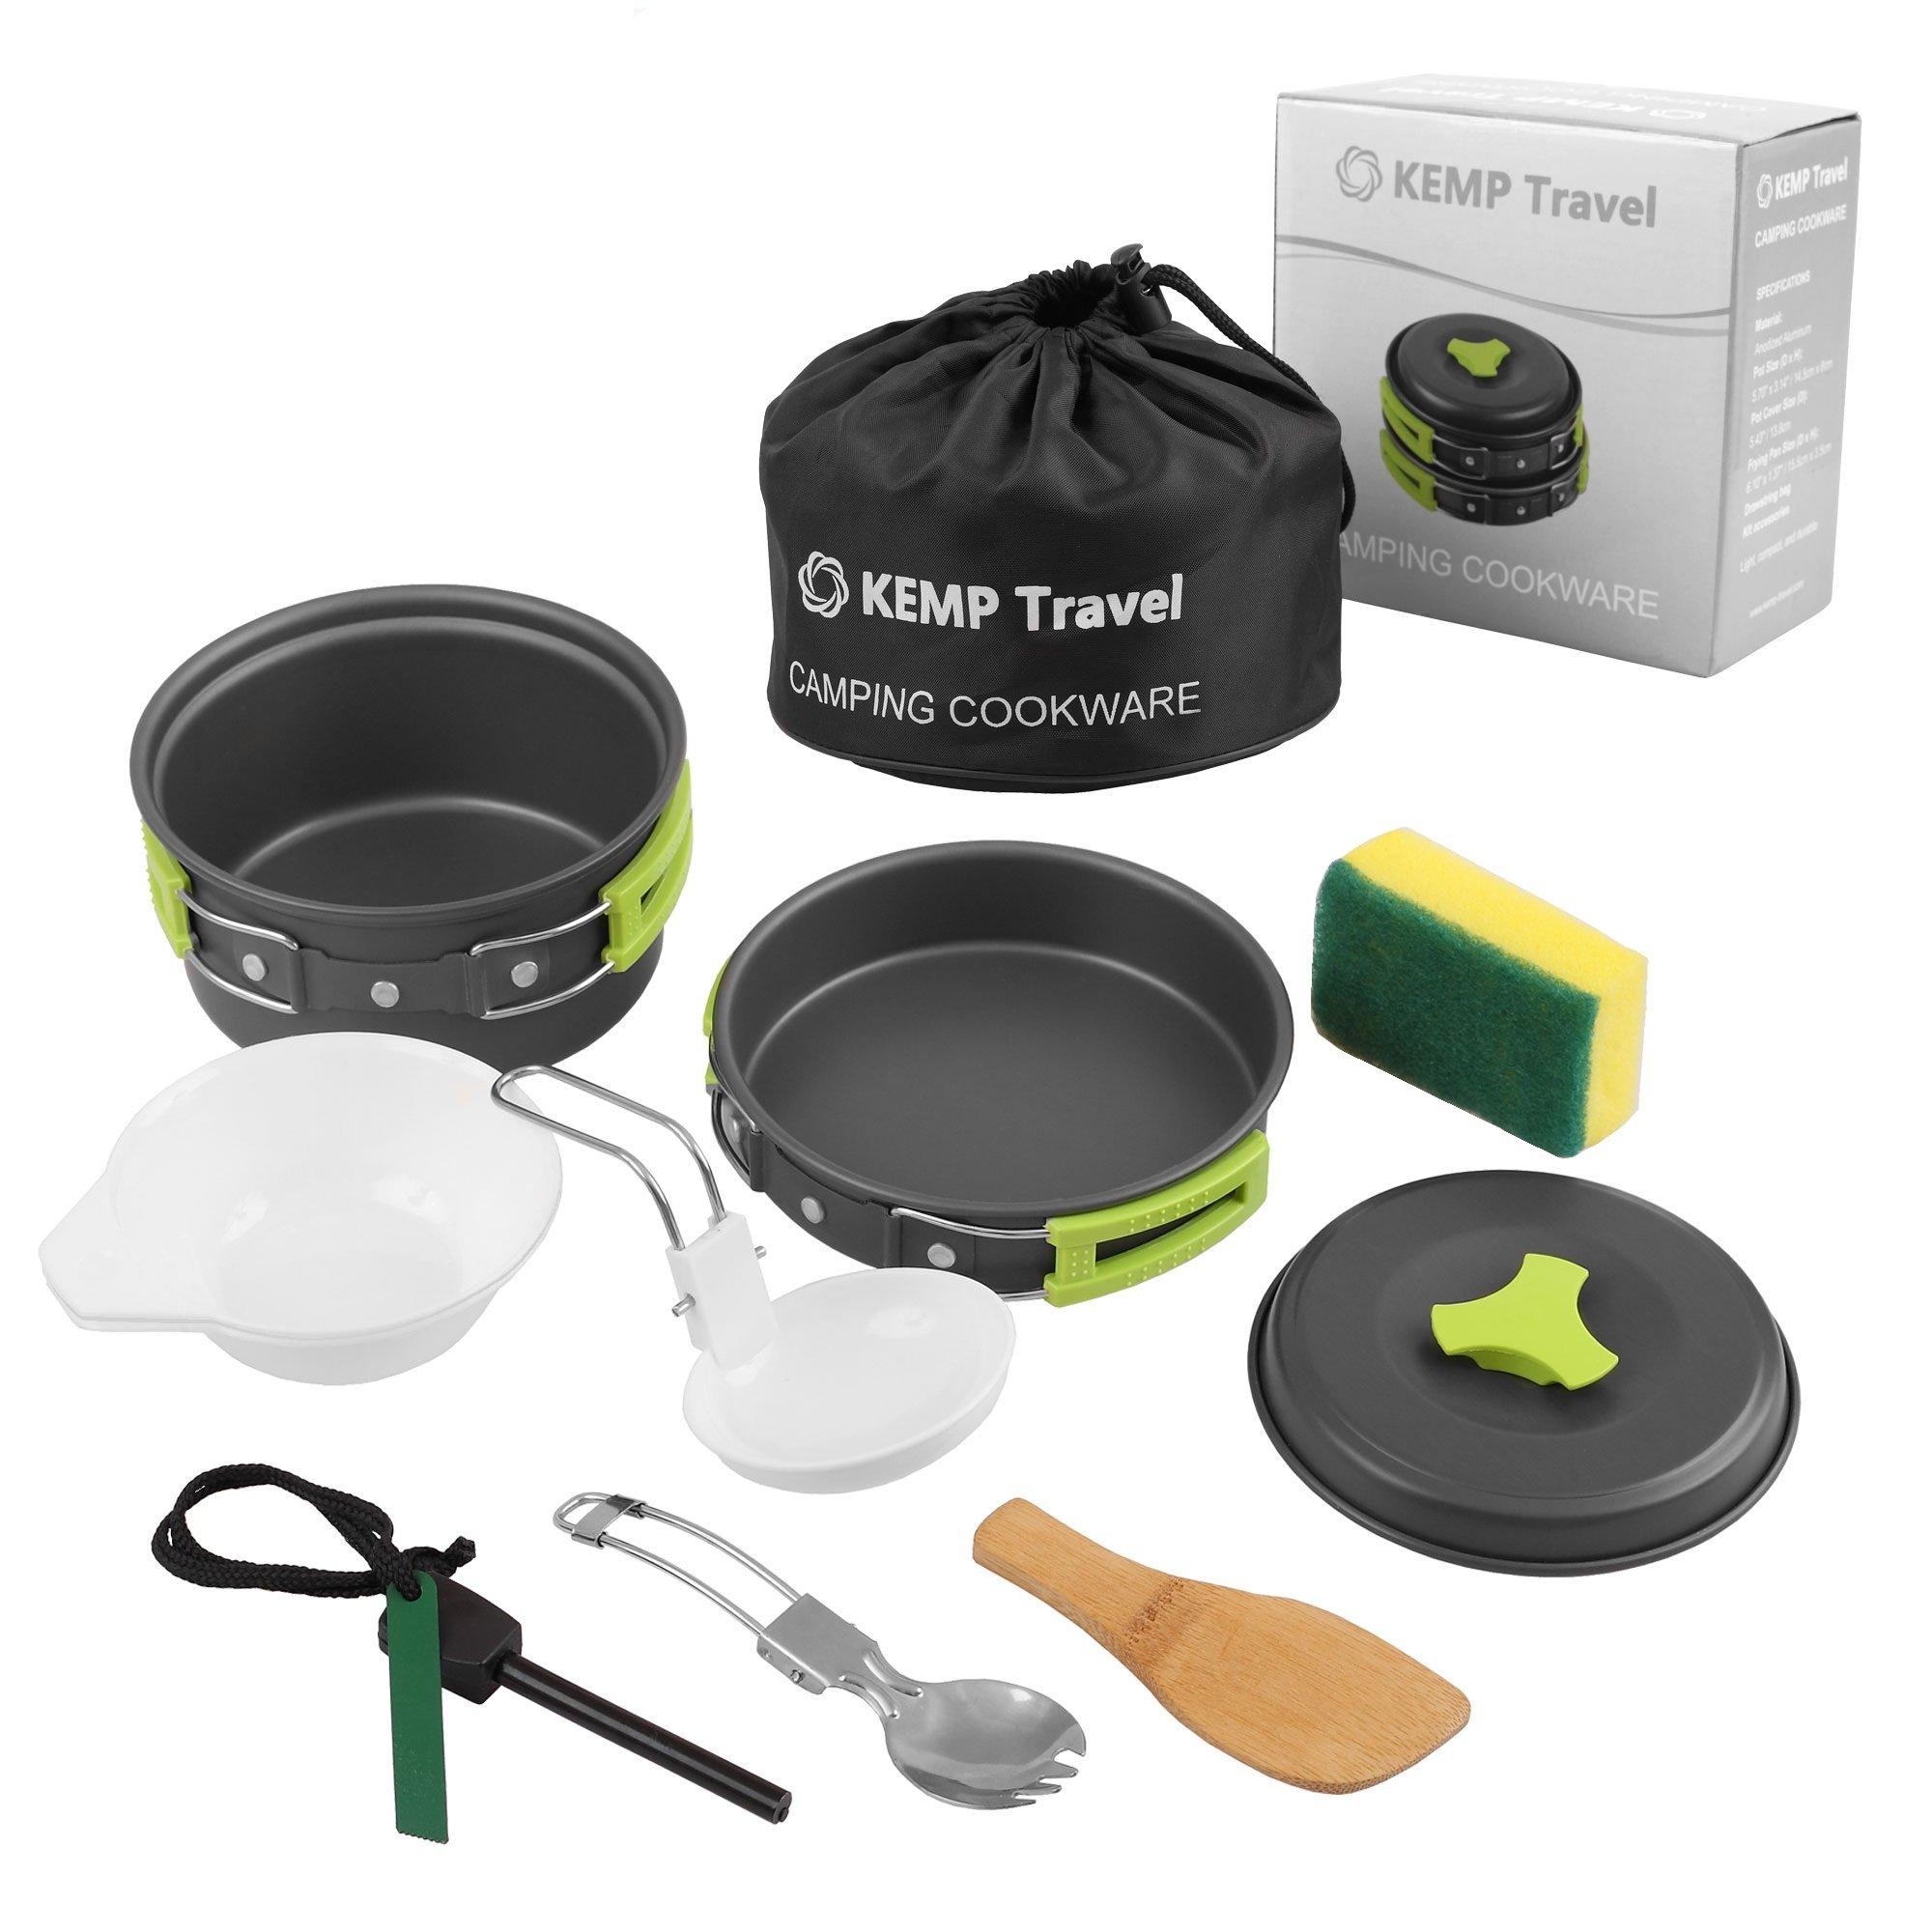 KEMP Travel Camping Cookware - 10pcs Backpacking Cooking Equipment - compact, lightweight anodized pot & pan - Nonstick Cookset - Hiking Mess Kit - Outdoor Gear- Camp Kitchen - Camping Utensil Set